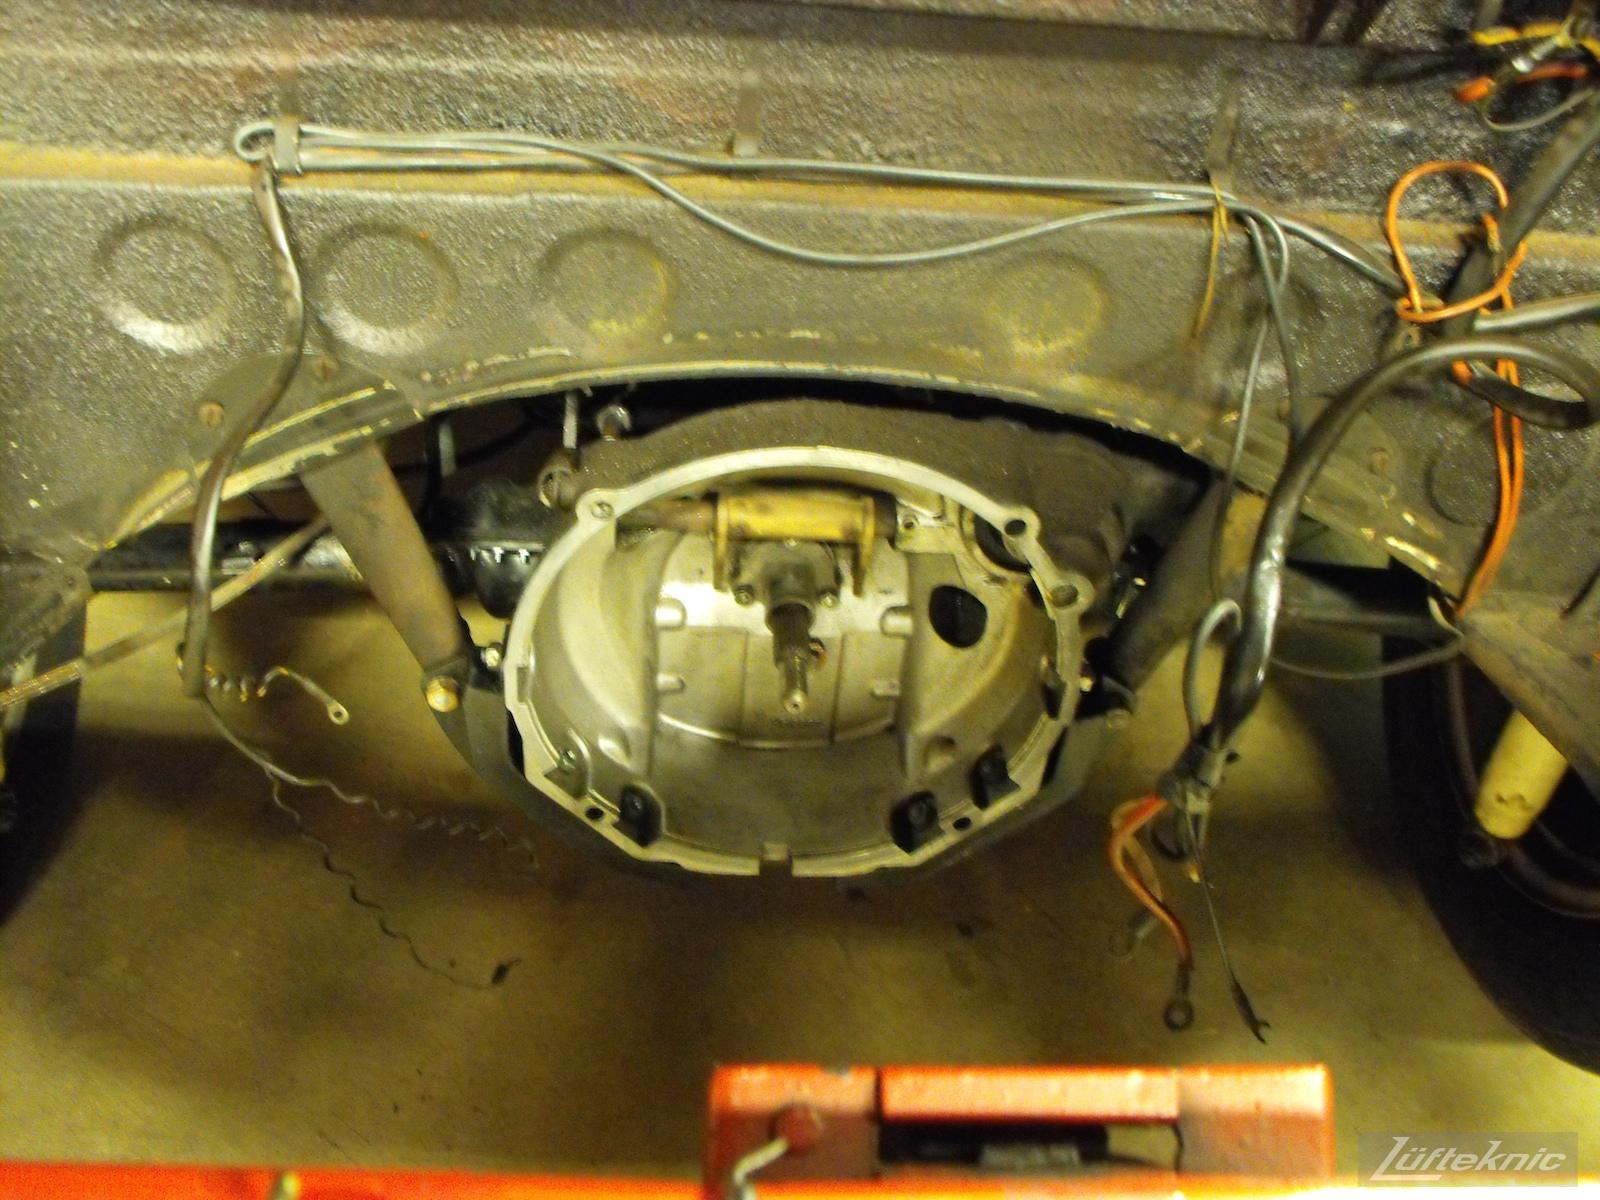 Engine out for a 1961 Porsche 356B Roadster restoration.